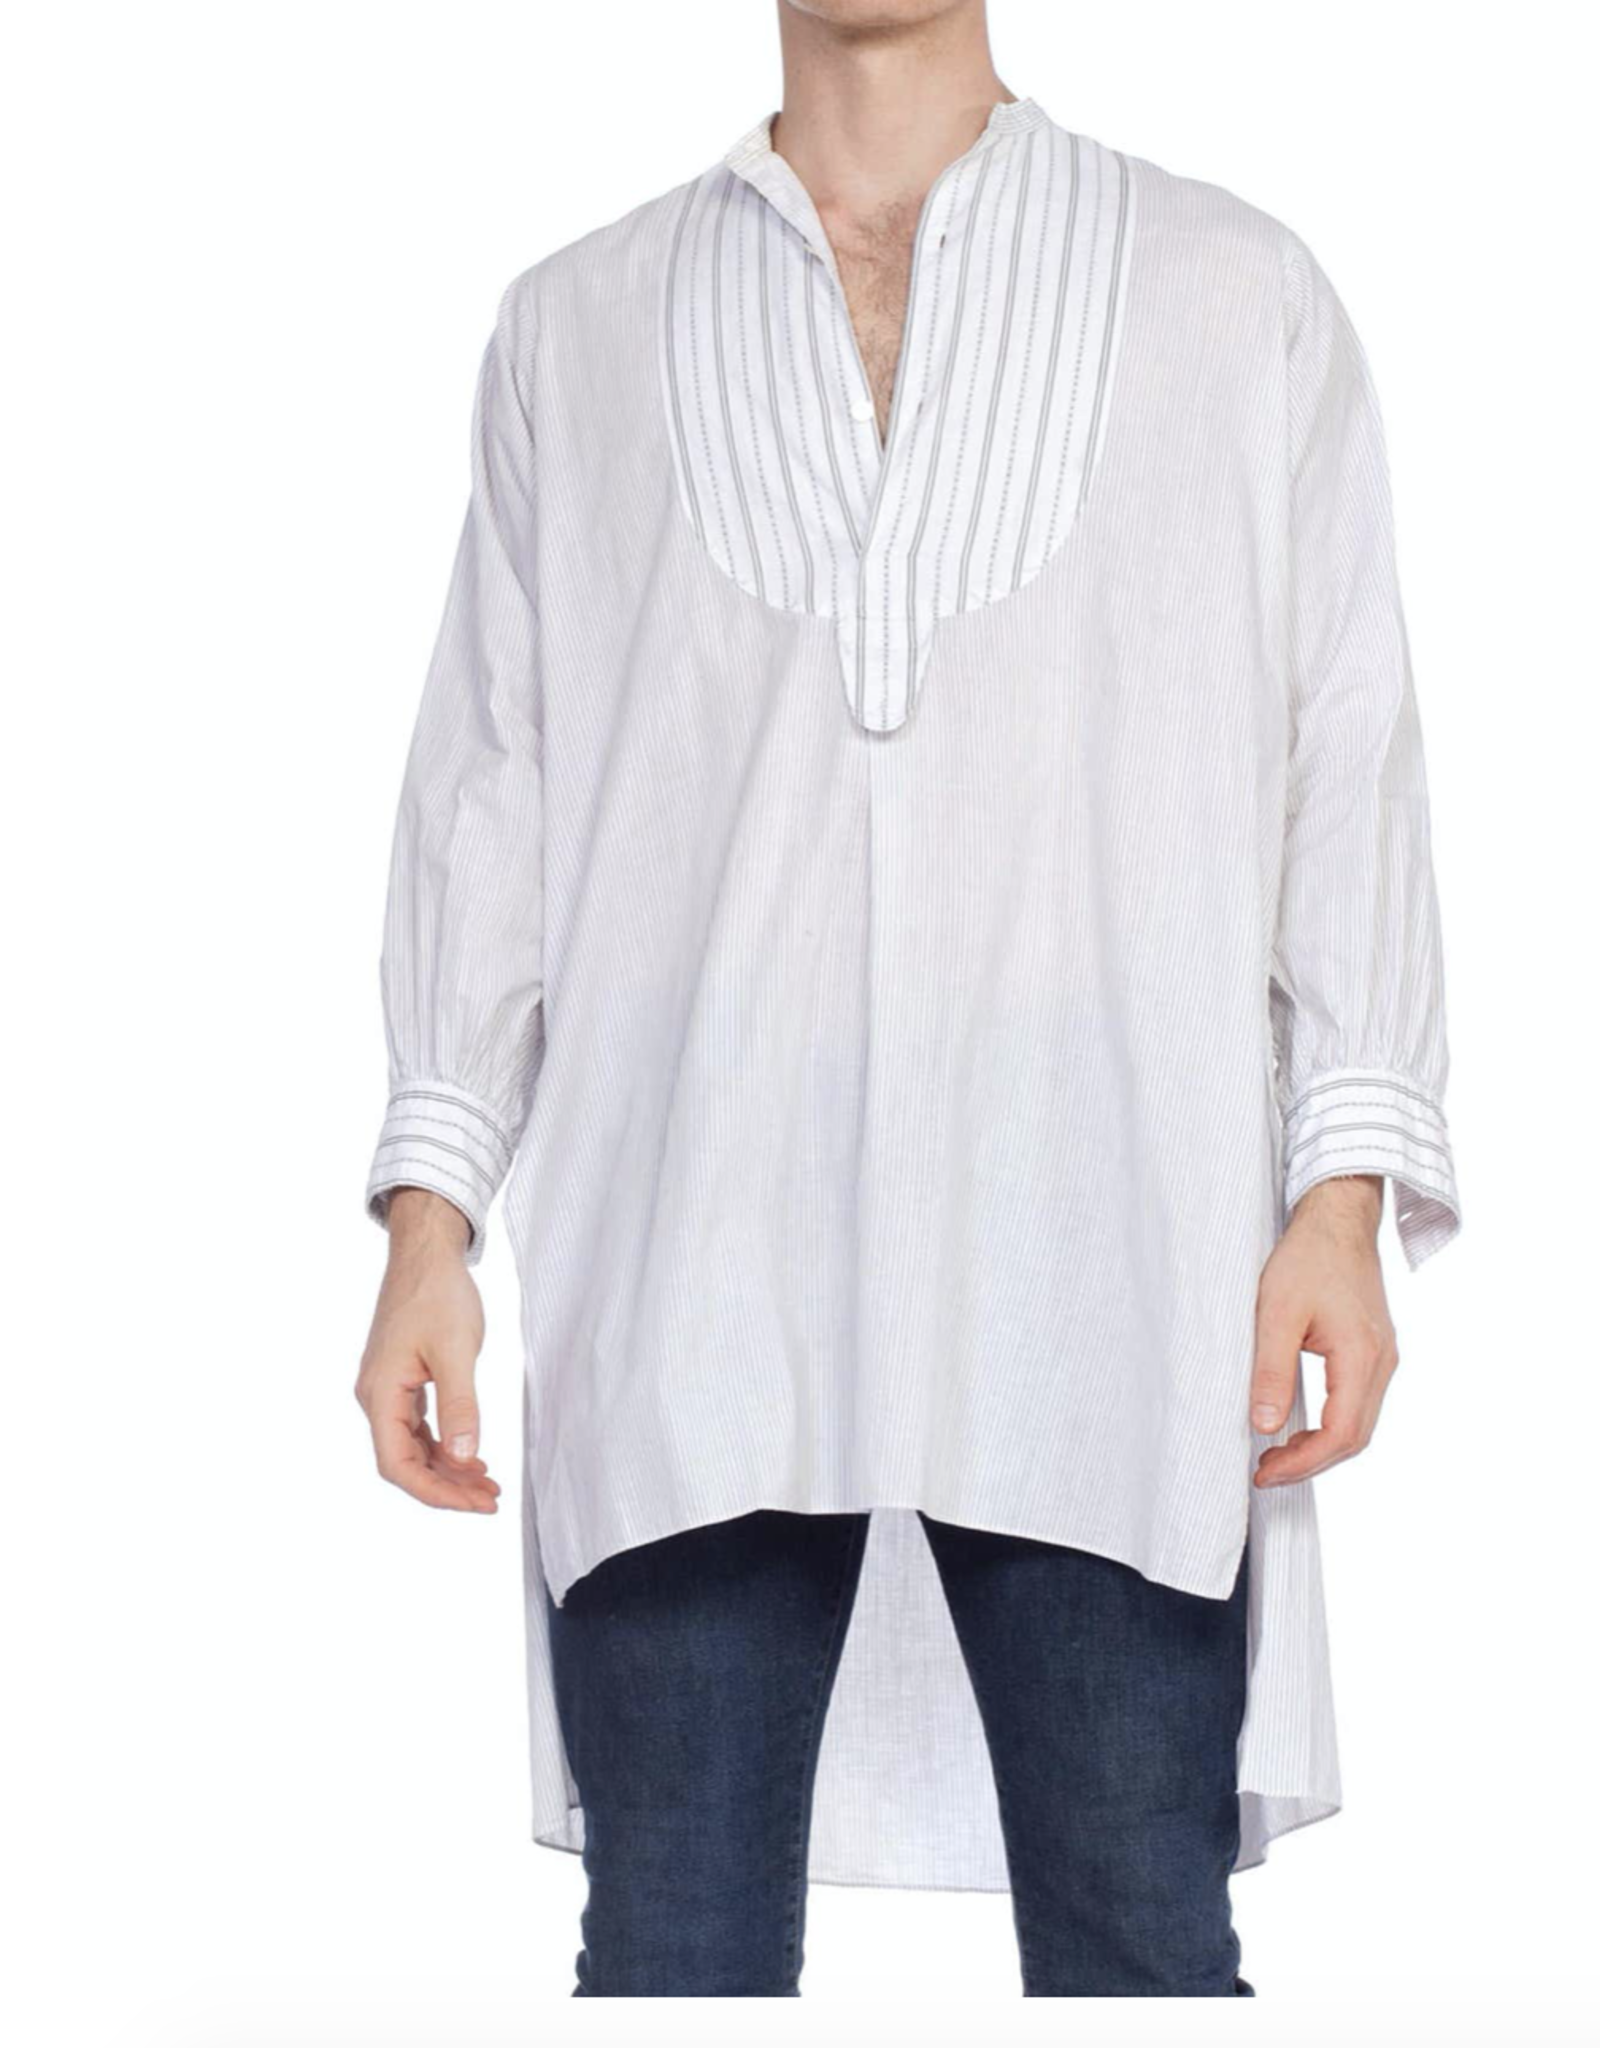 Victorian Black & White Organic Cotton Mens Antique Bib Front Pinstripe Shirt MENSS8ON0557